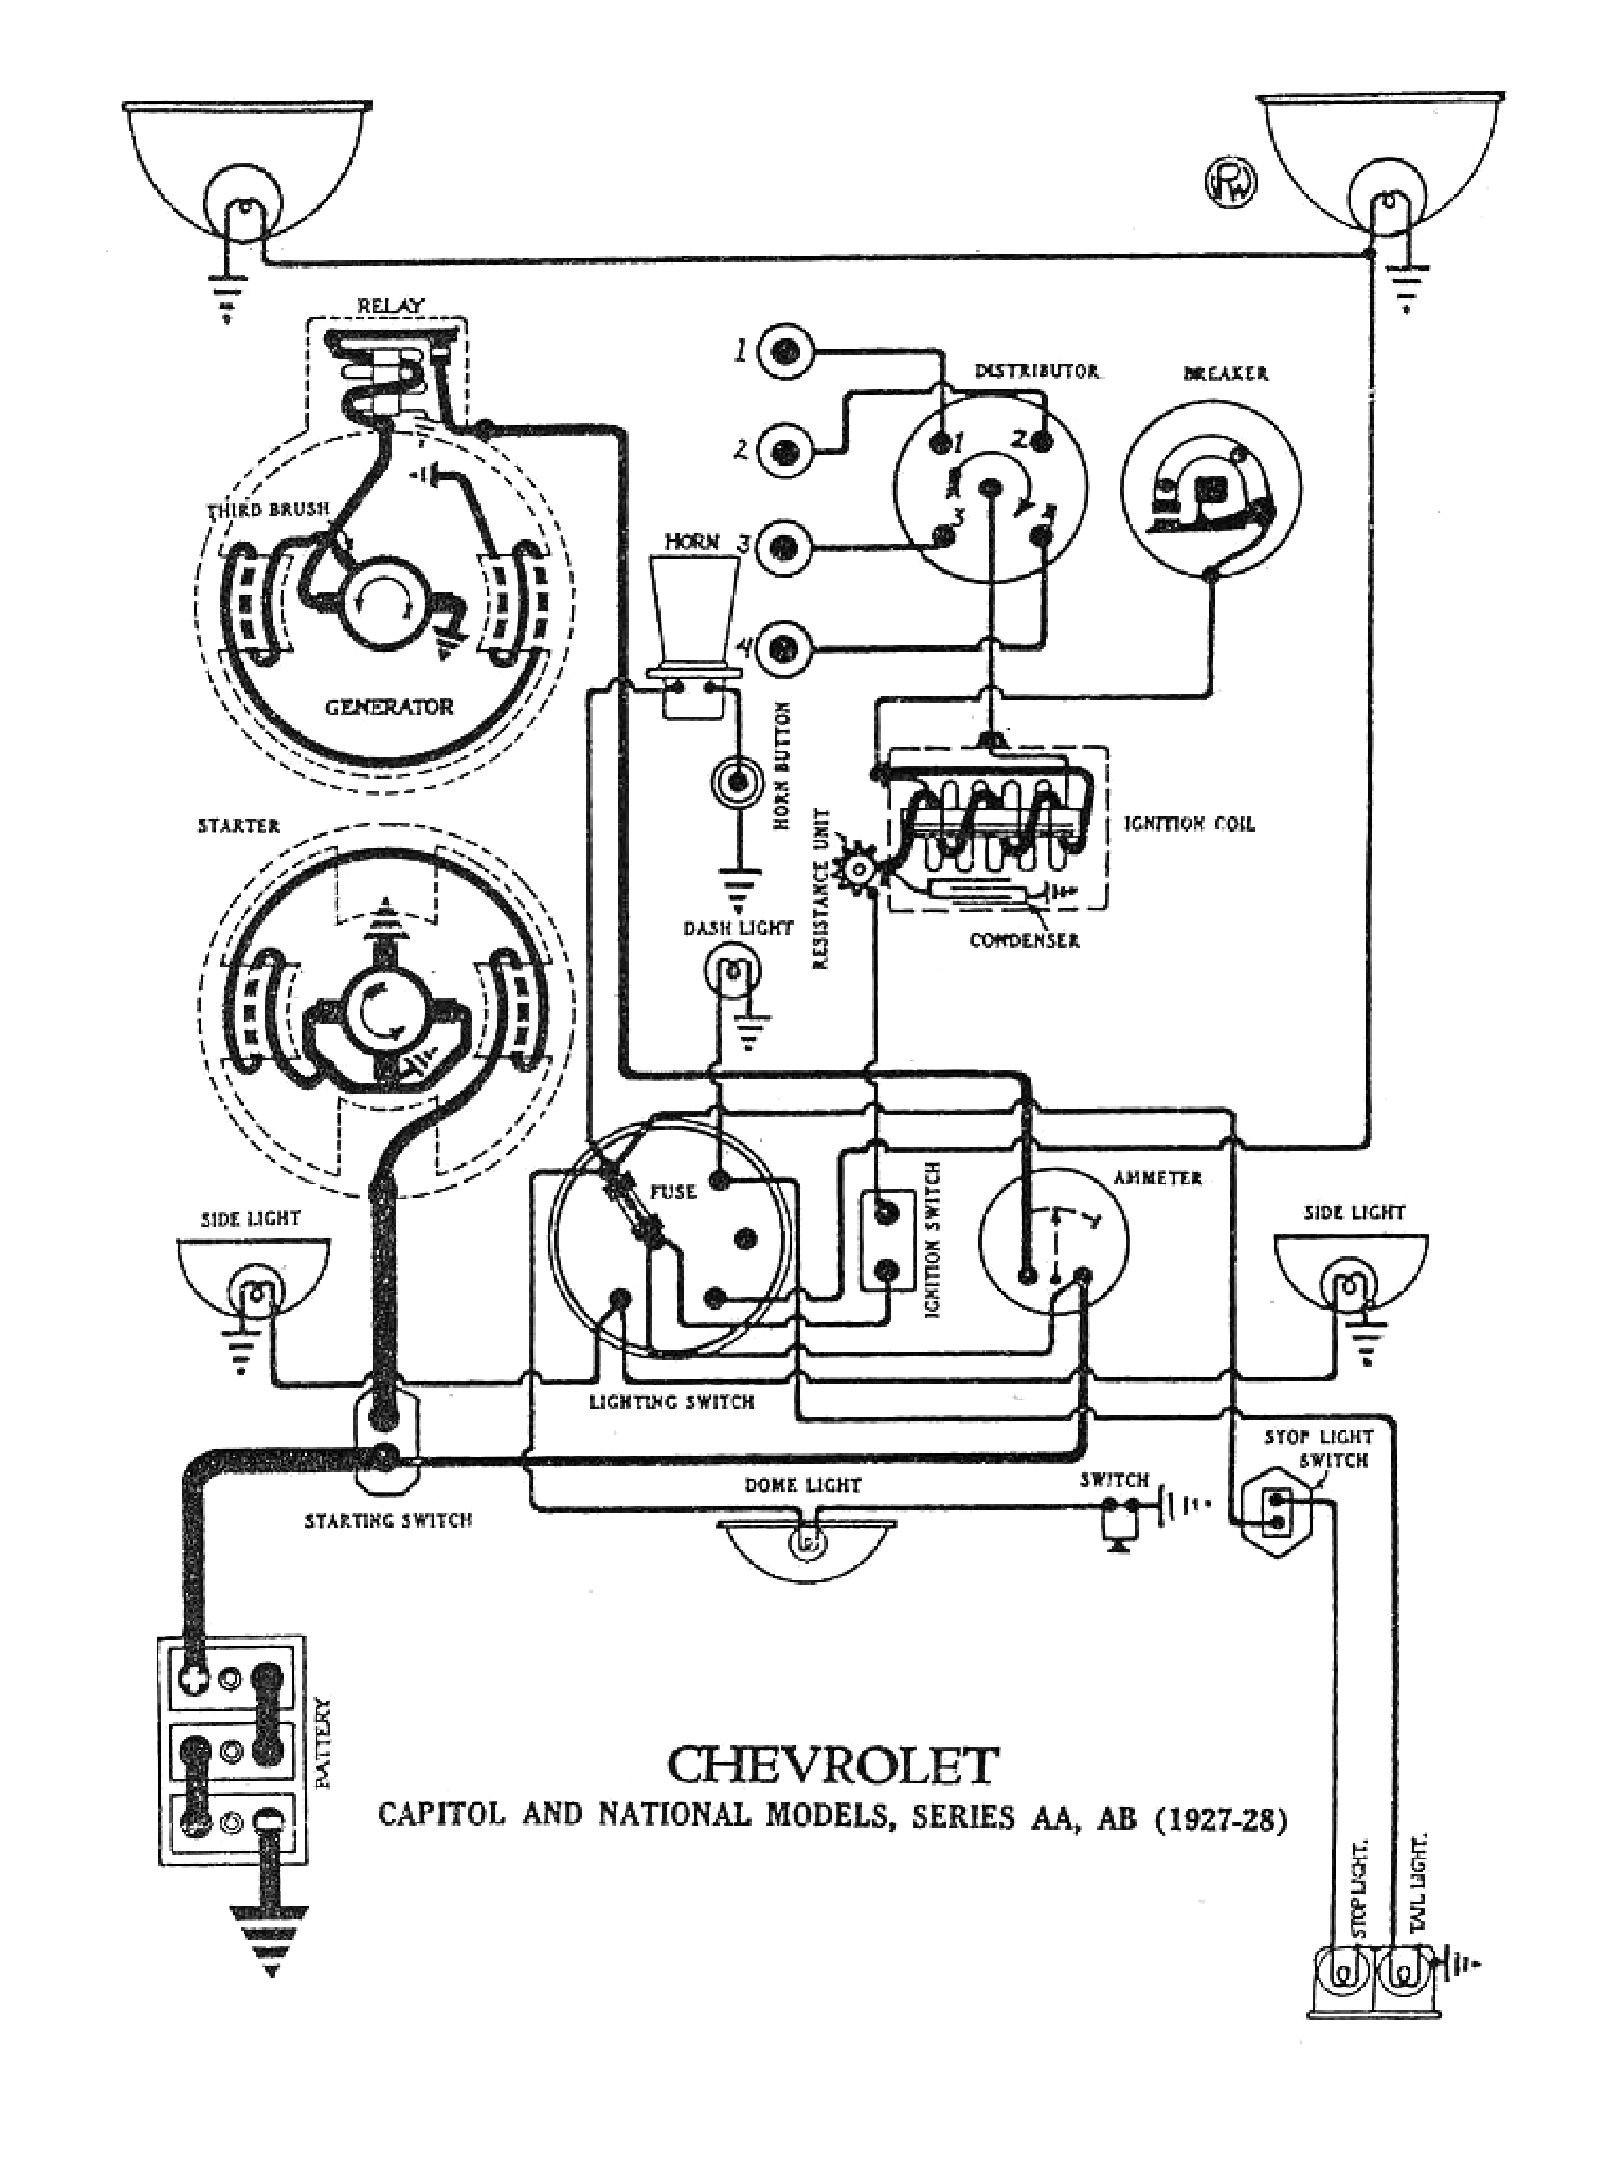 Bm 8244 Chevy S10 2 2 Engine Diagram 2000 Free Diagram